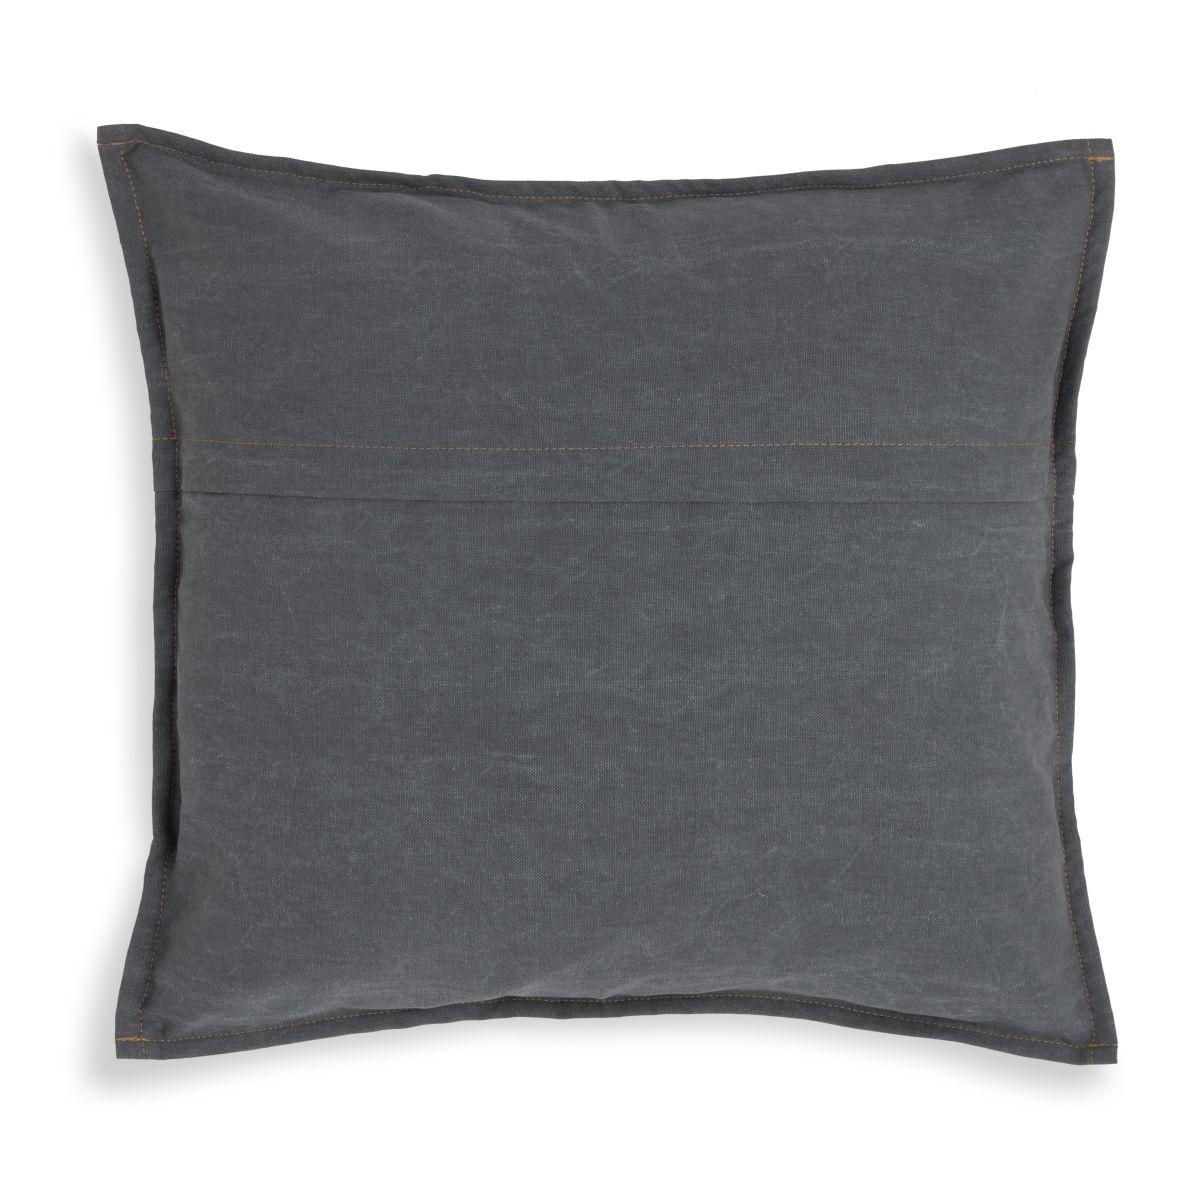 knit factory kf154012013 hope kussen jeans 50x50 2